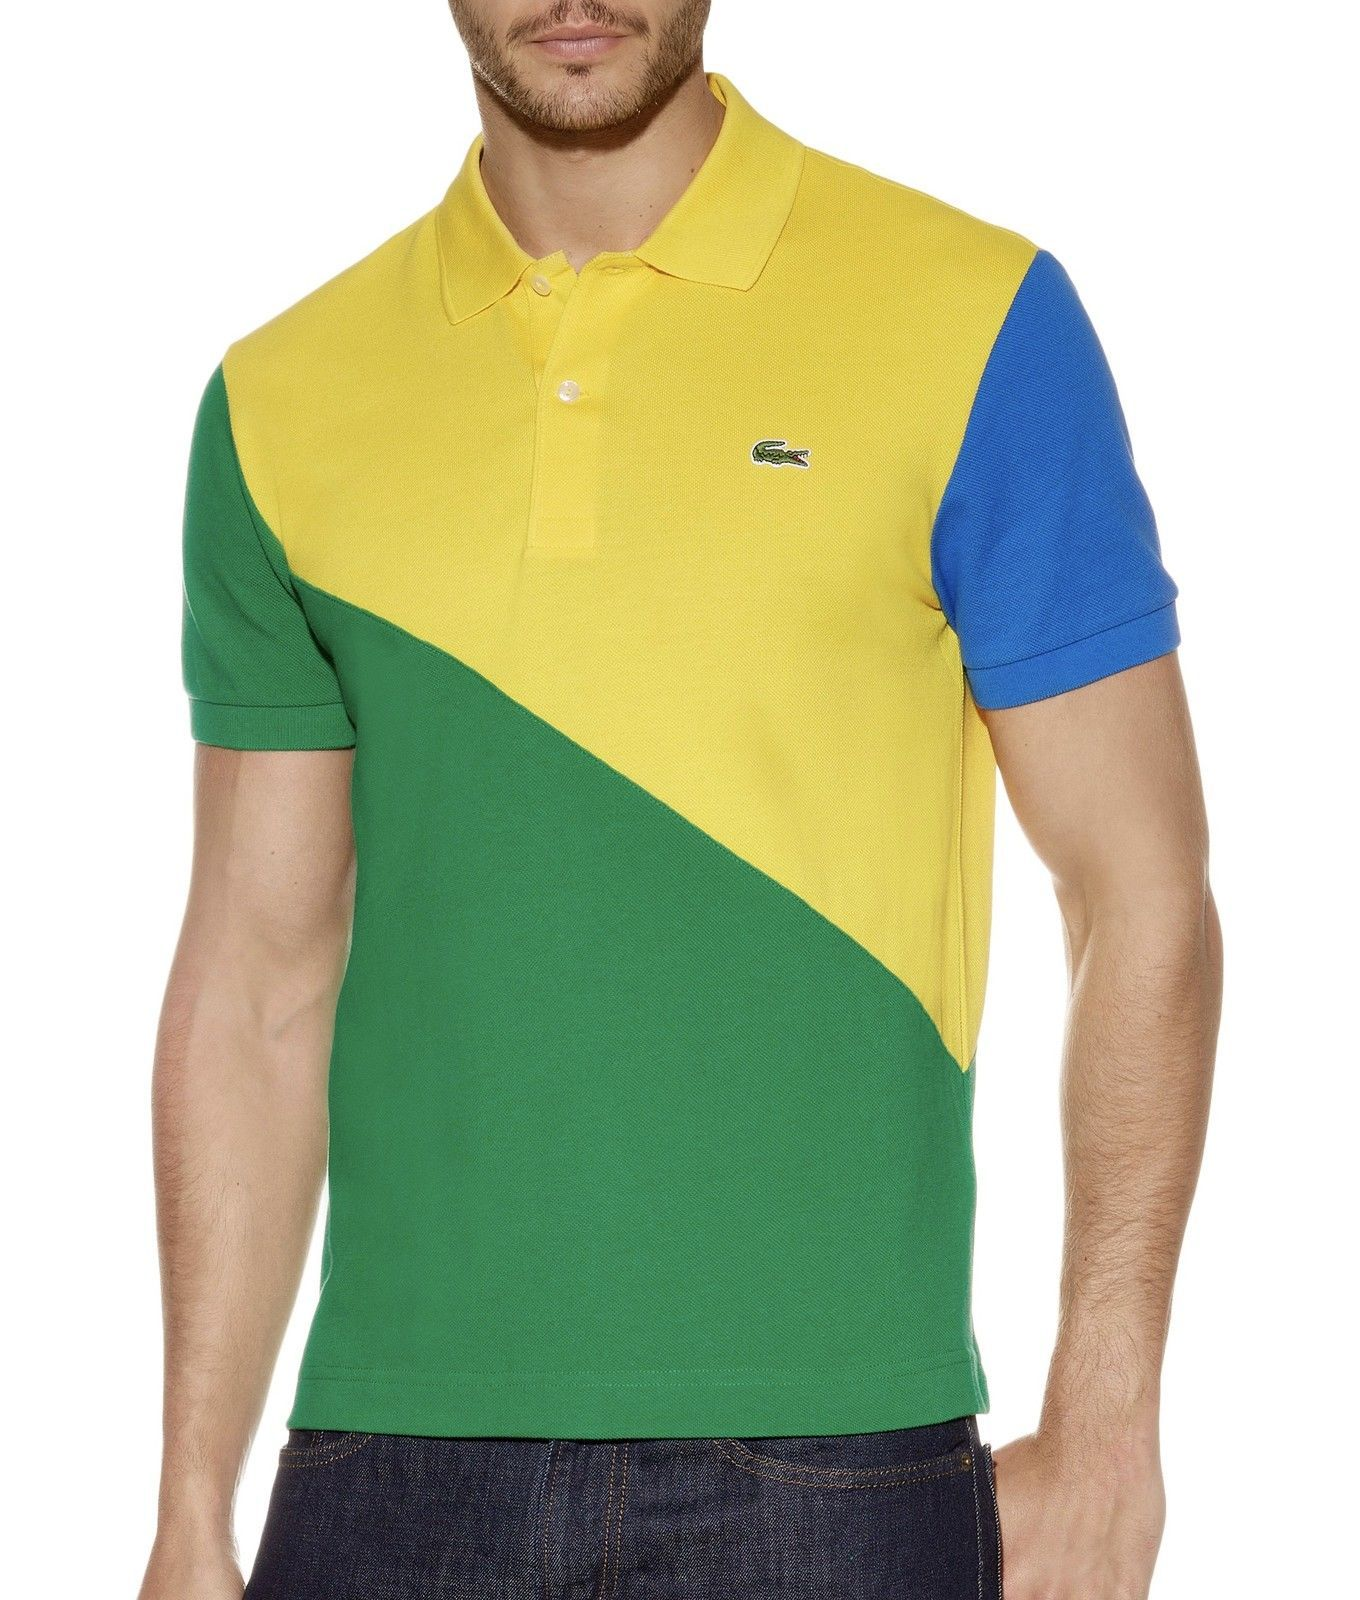 New Lacoste Mens Athletic Premium Cotton Polo Shirt T Shirt Brazil Logo Polo Shirt Cotton Polo Shirt Cotton Polo